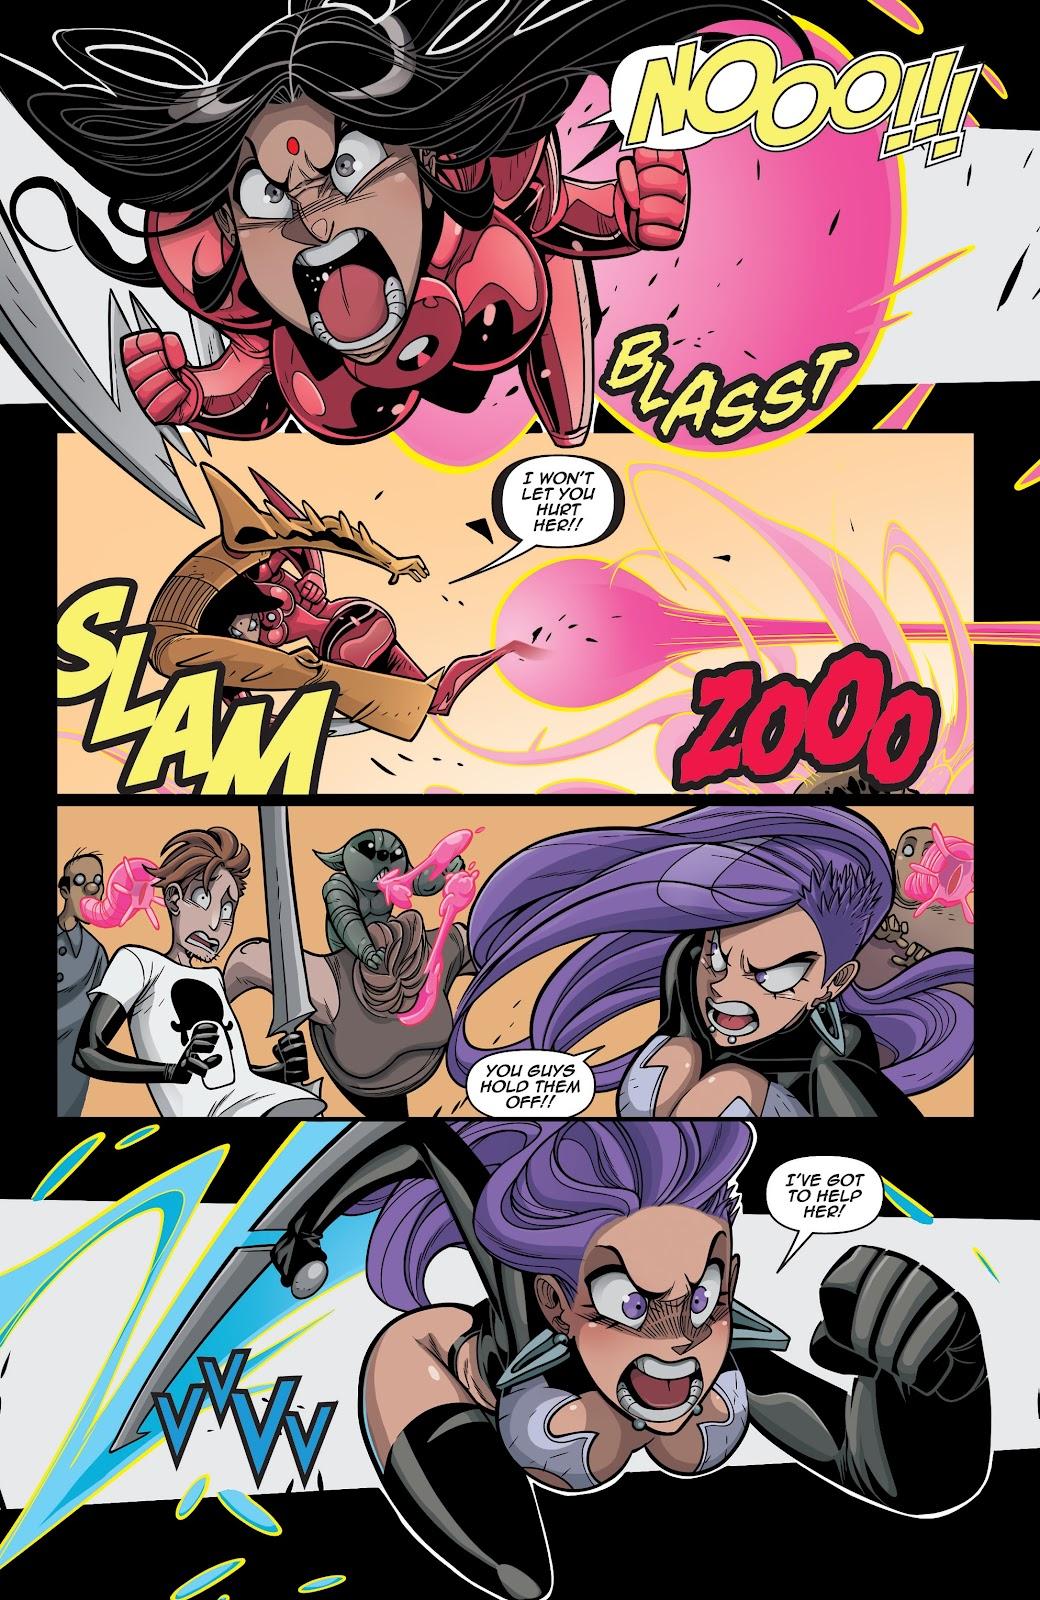 Read online Vampblade Season 3 comic -  Issue #12 - 17